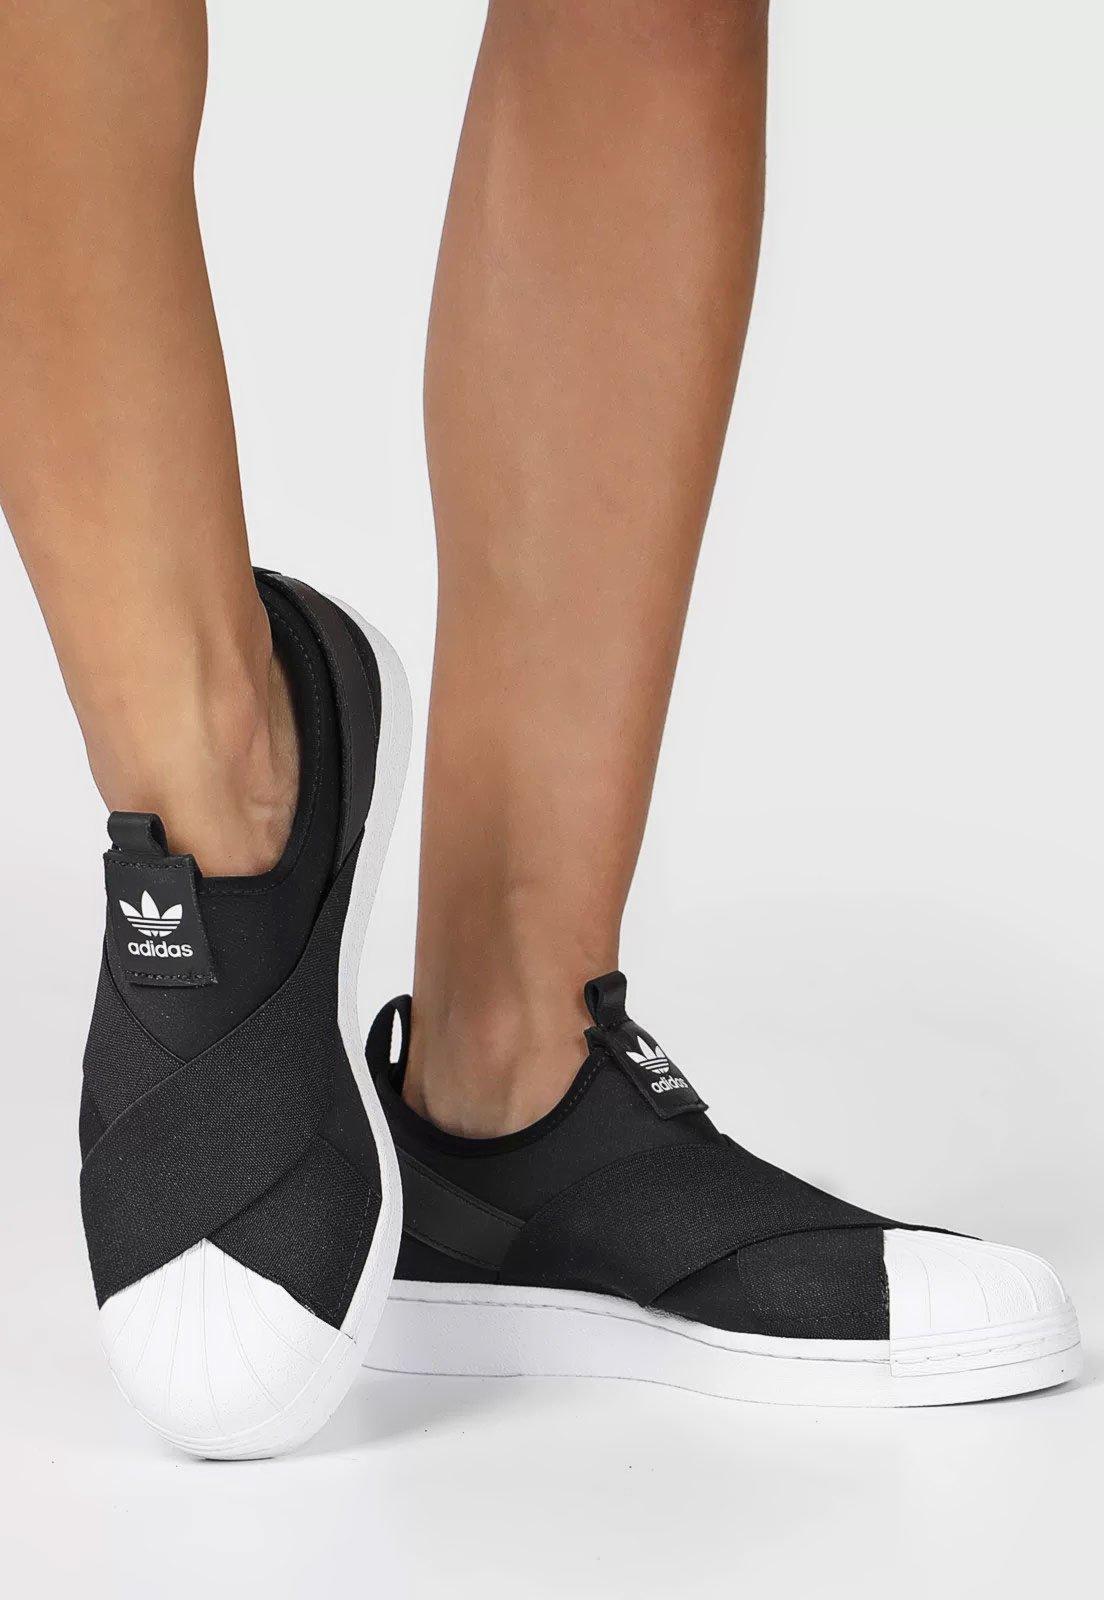 Tênis adidas Originals Superstar Slip on W Preto - Marca adidas Originals